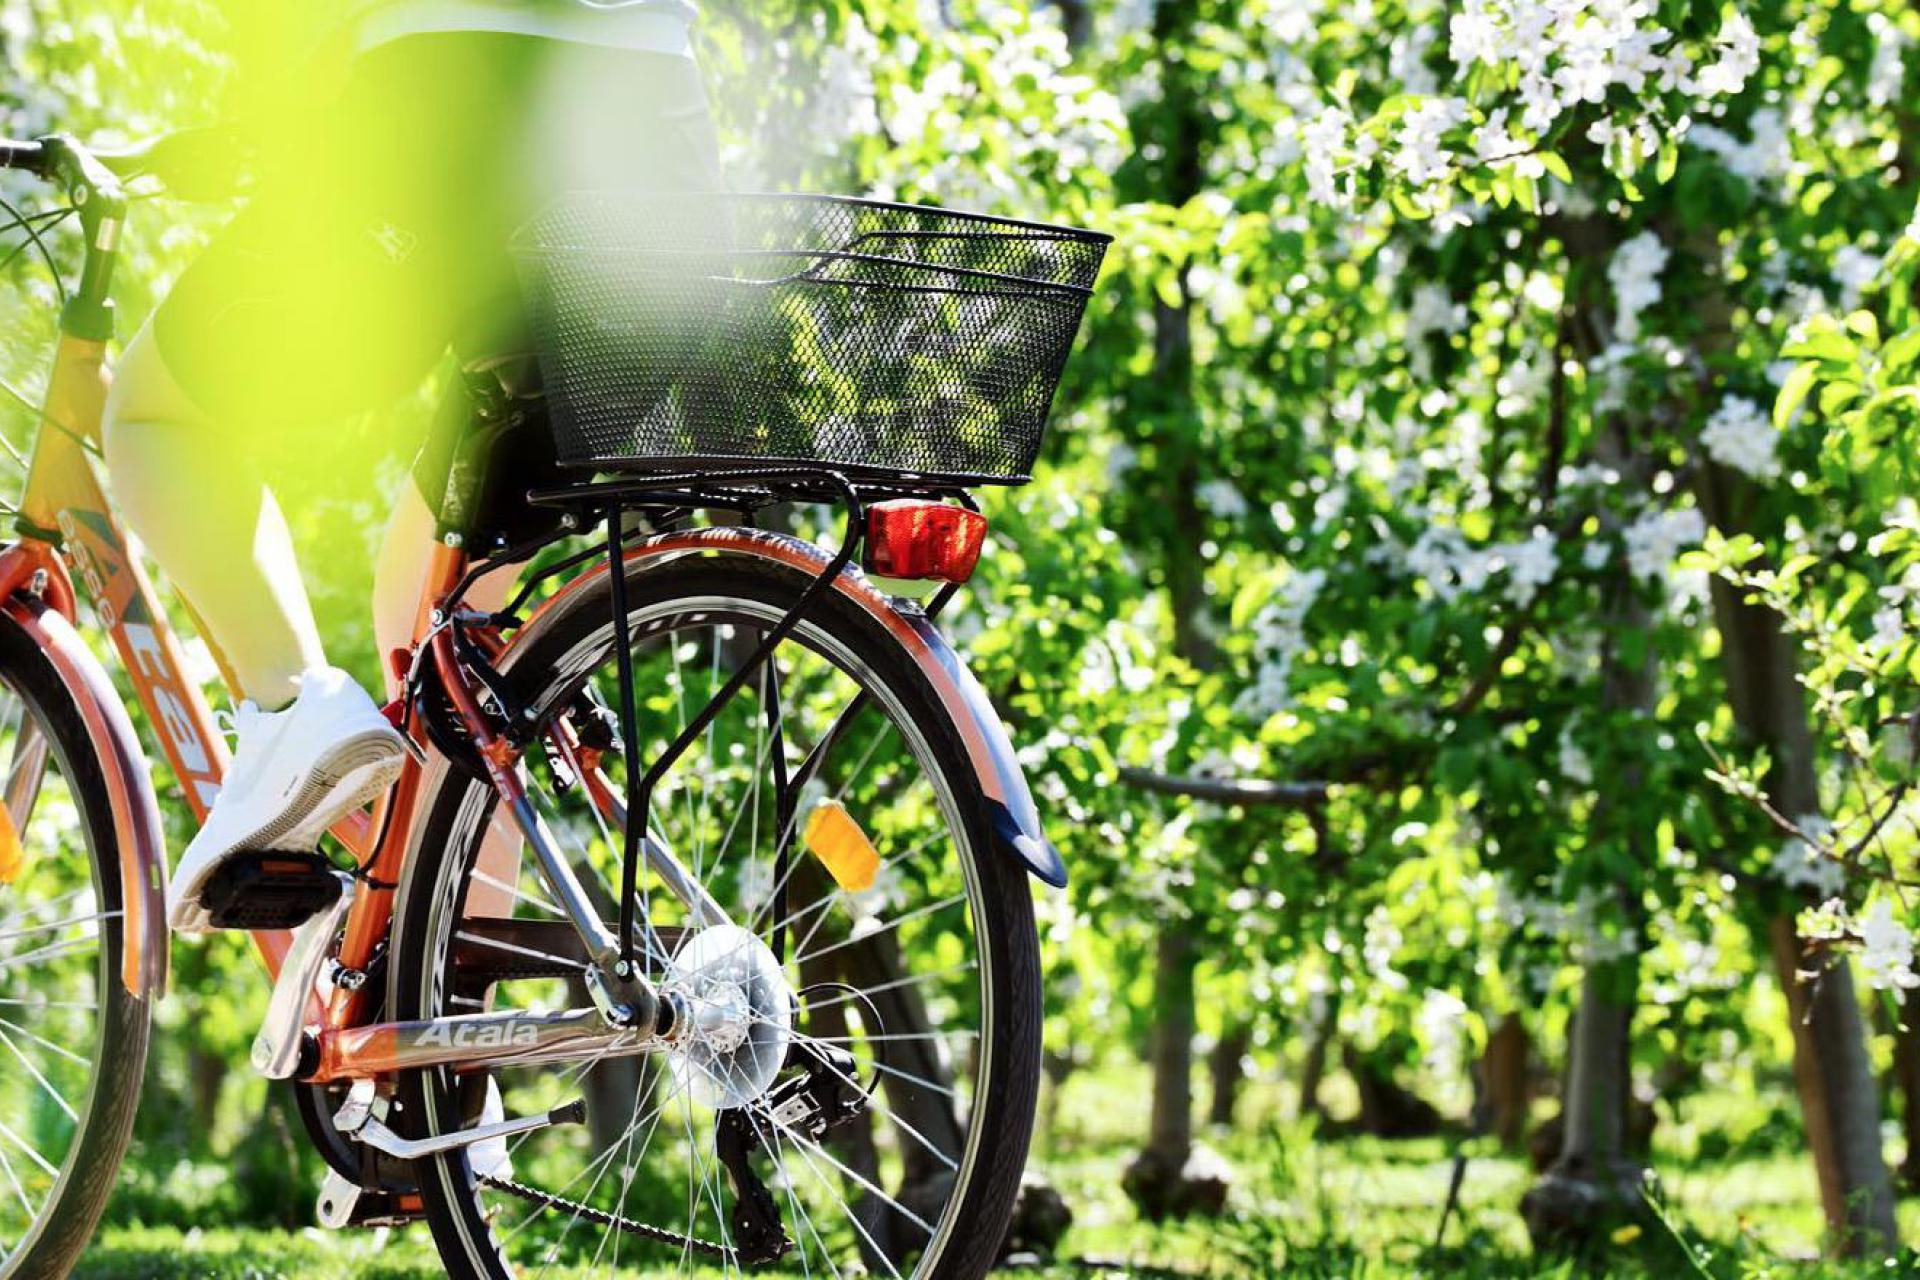 Agriturismo Dolomieten Knusse agriturismo tussen de appelbomen in de Dolomieten